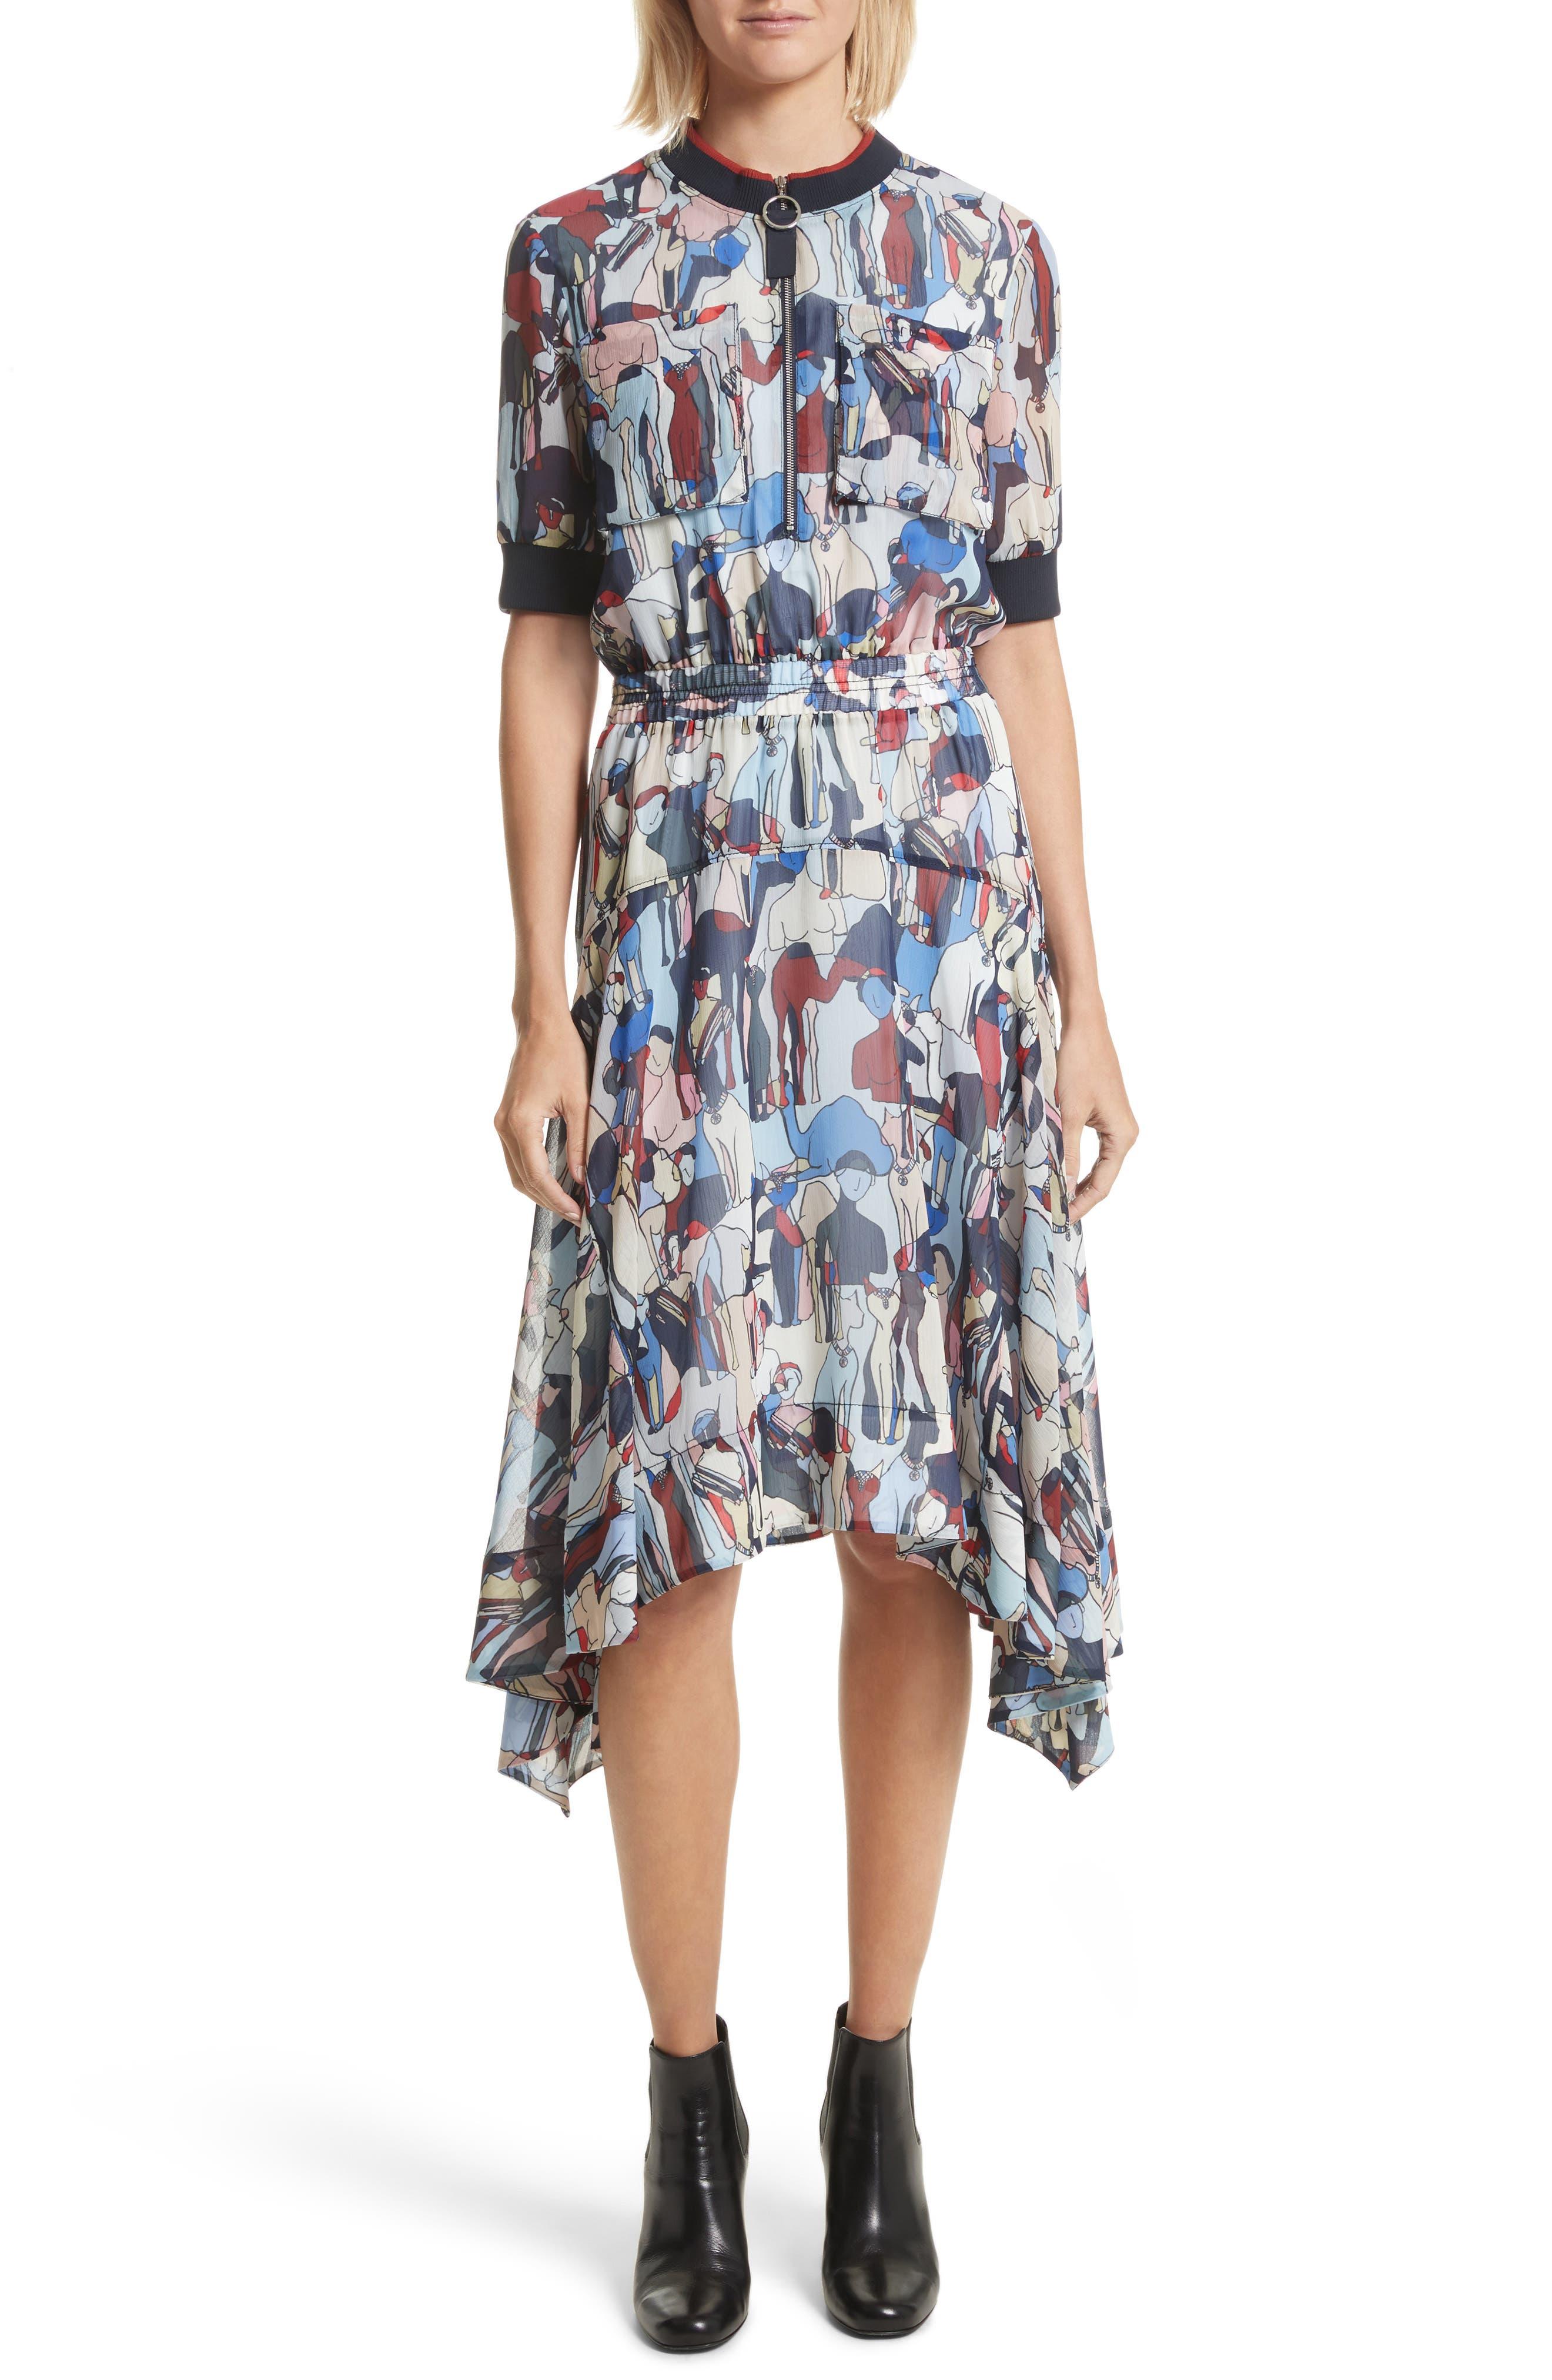 GREY Jason Wu Print Handkerchief Hem Dress